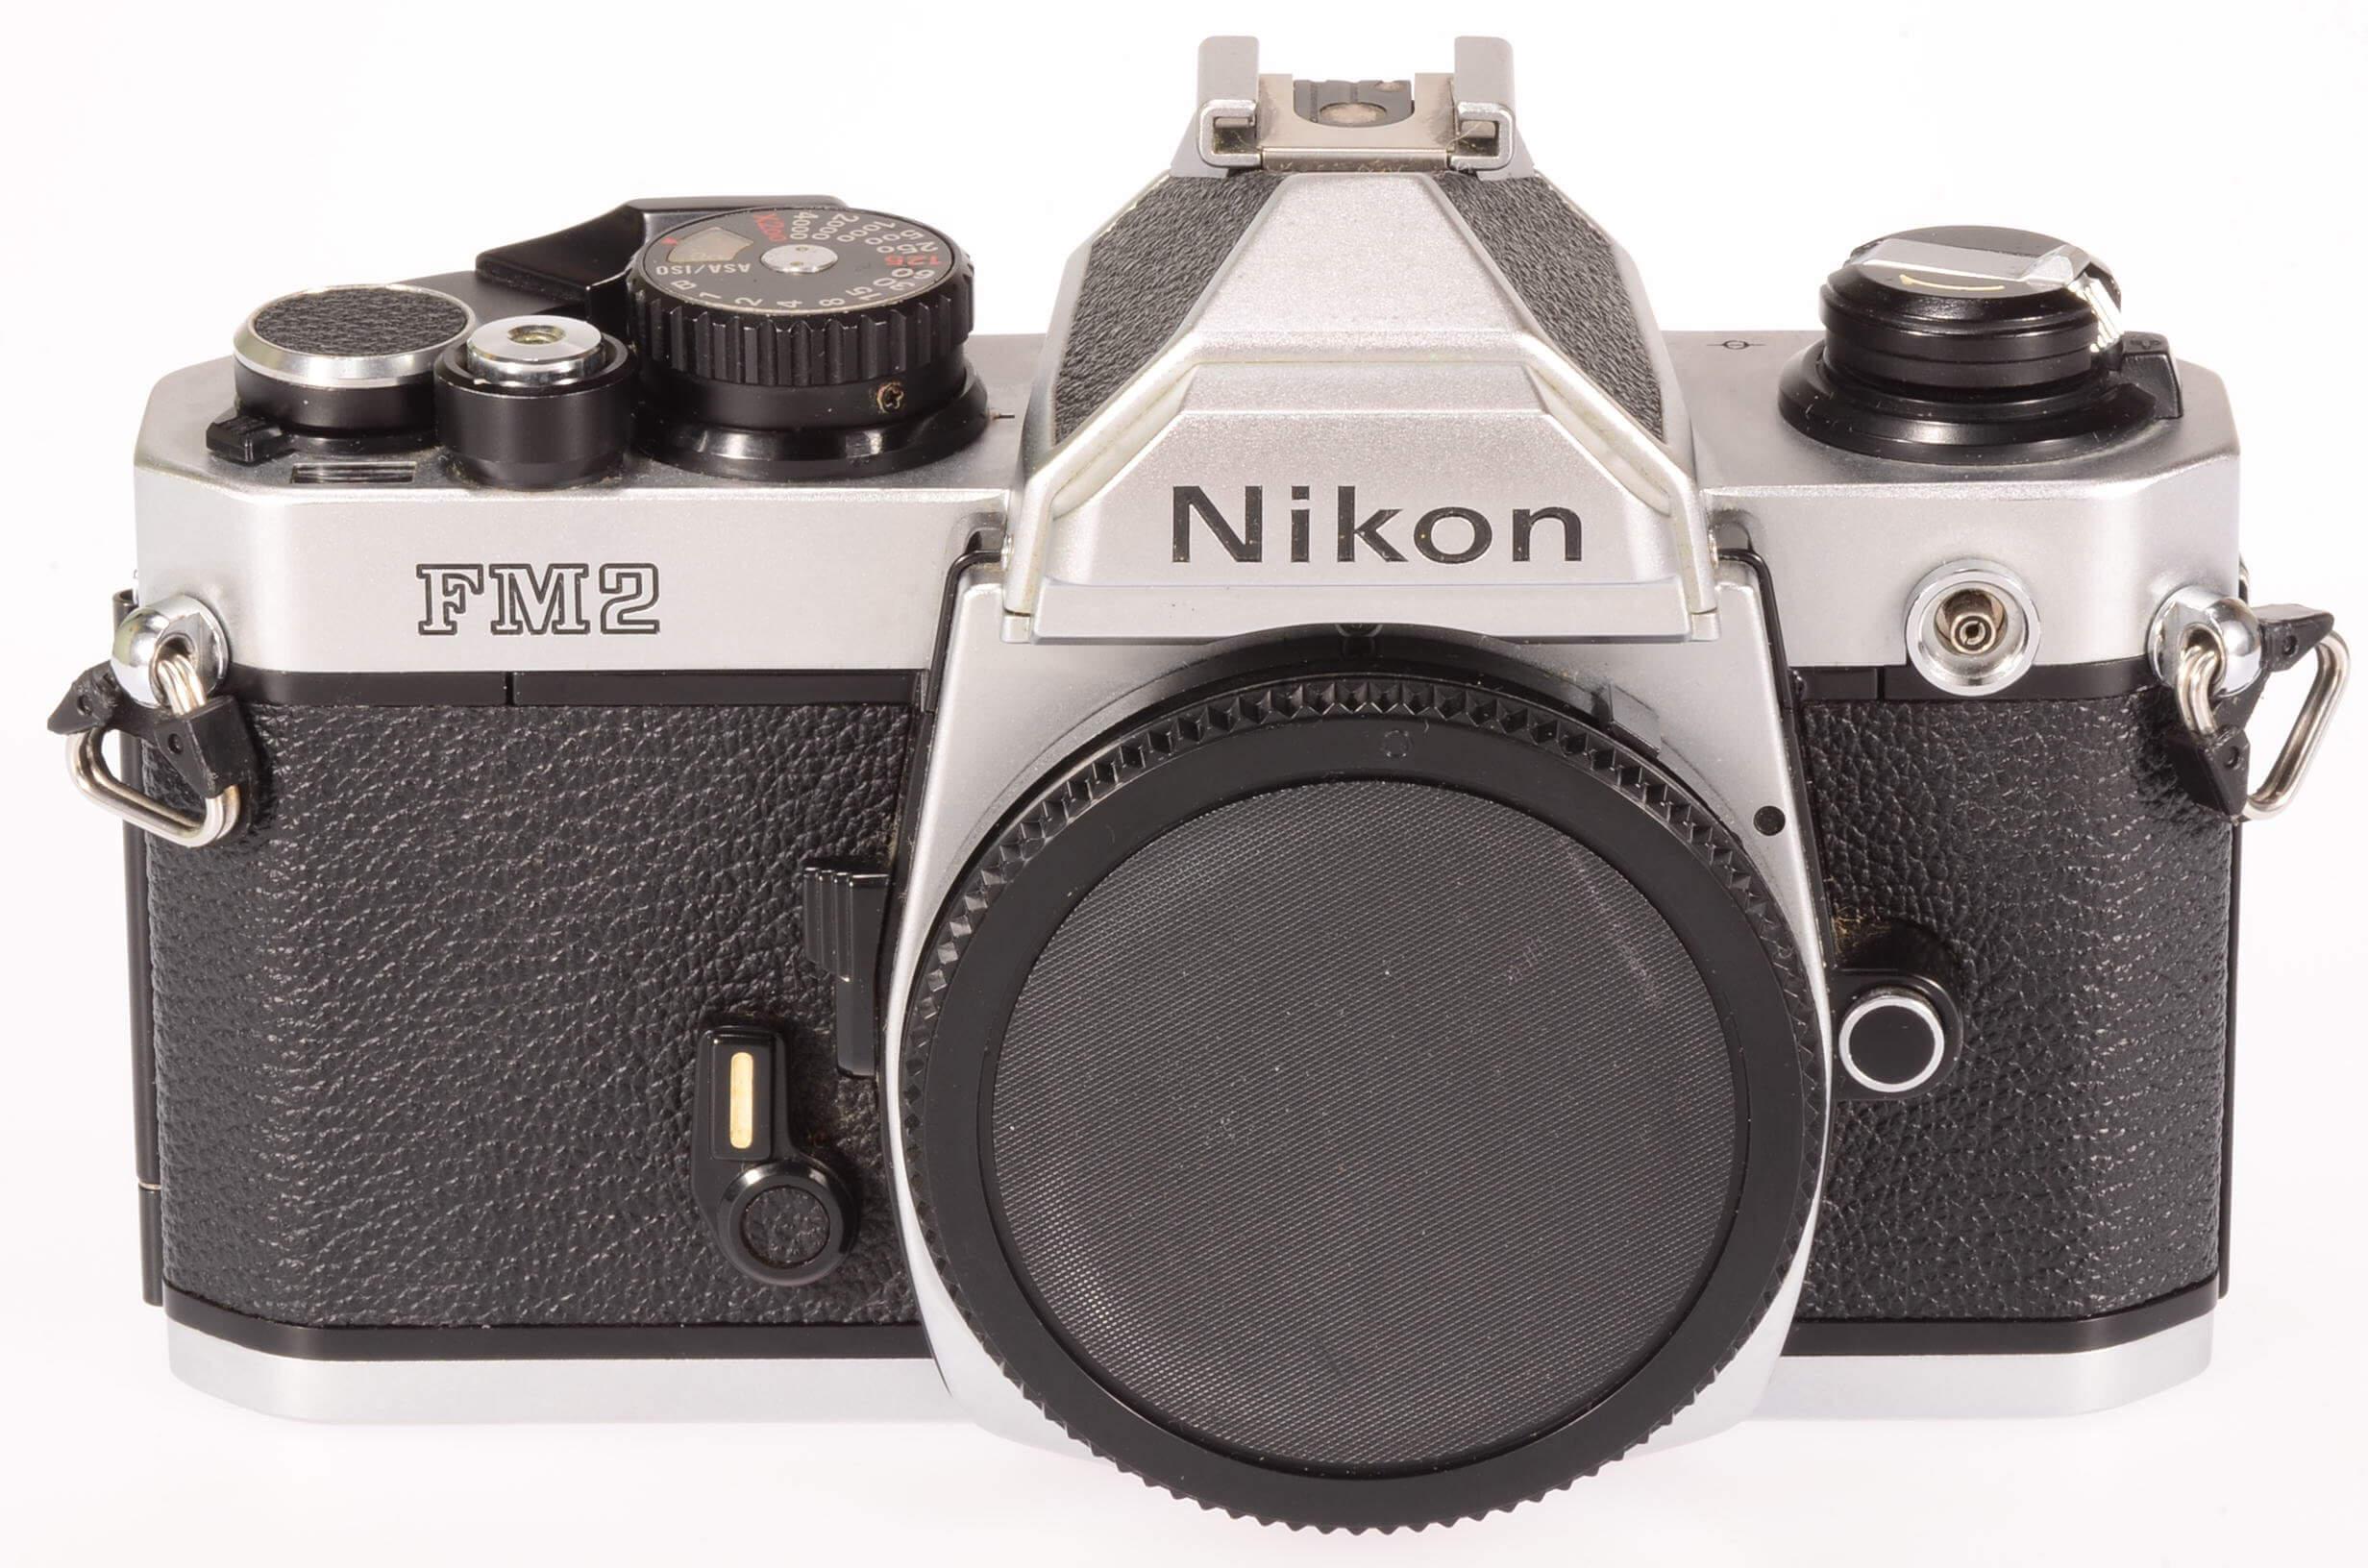 Nikon FM2 body, chrome, almost mint